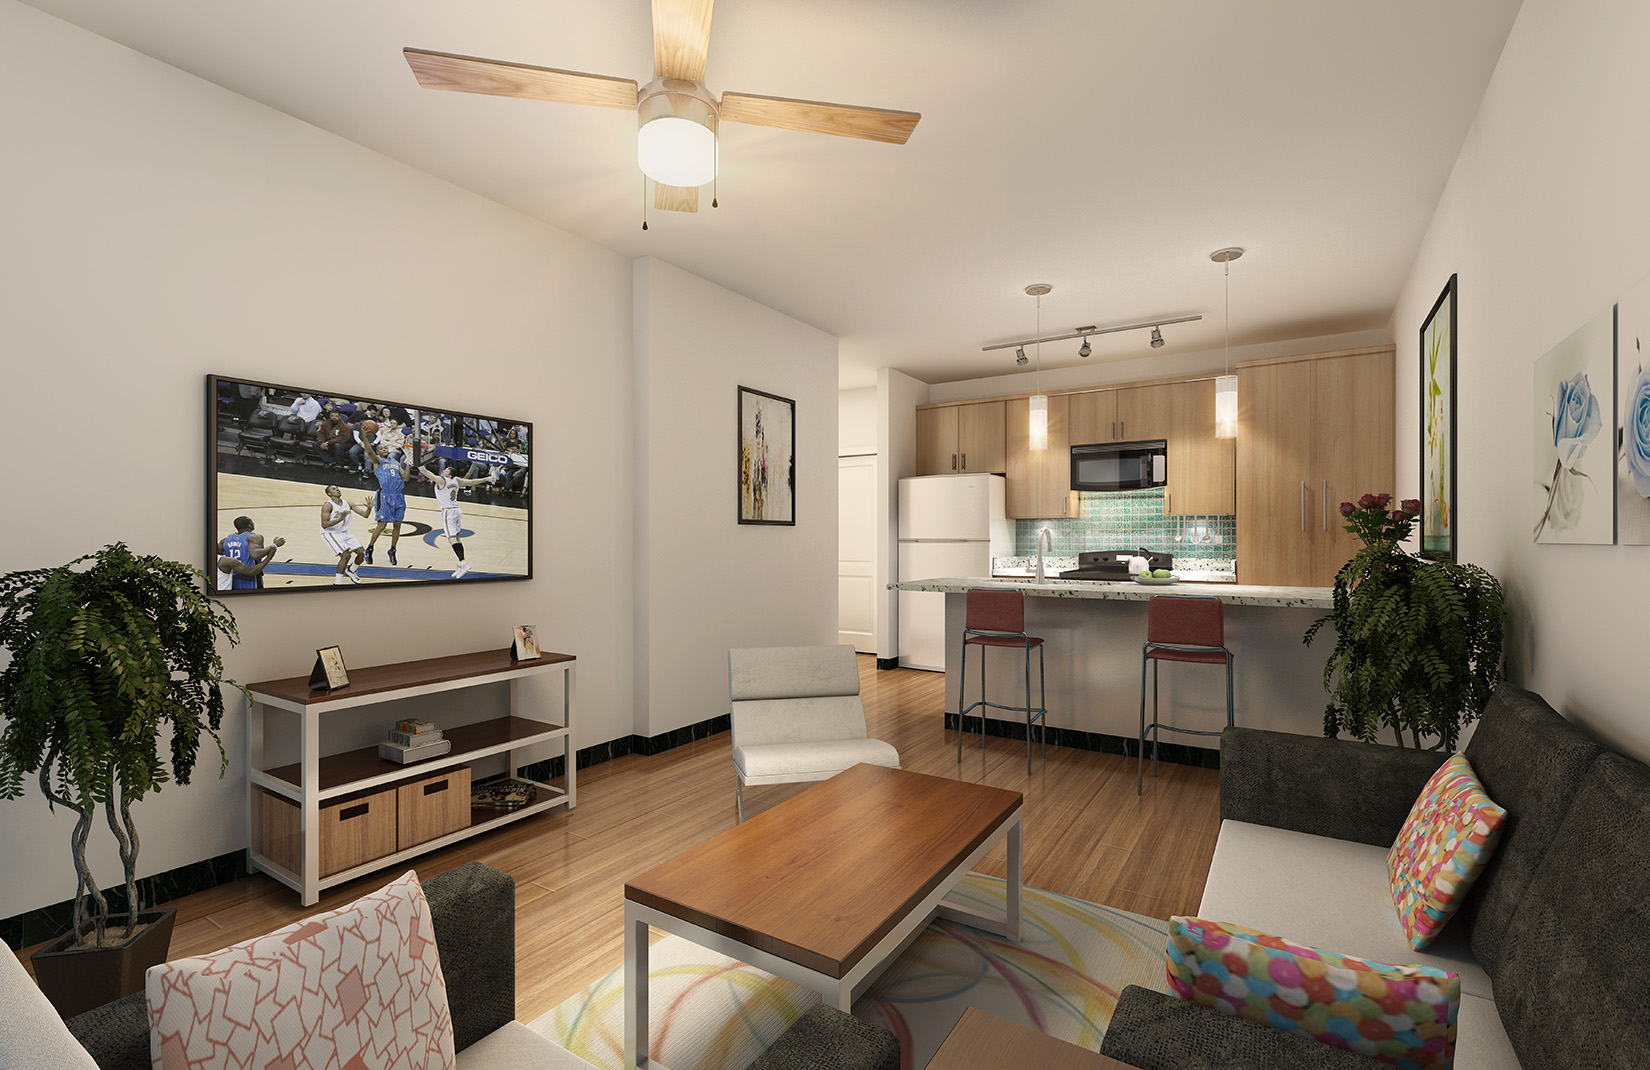 Urban Off Campus Student Housing Development Will Add 446